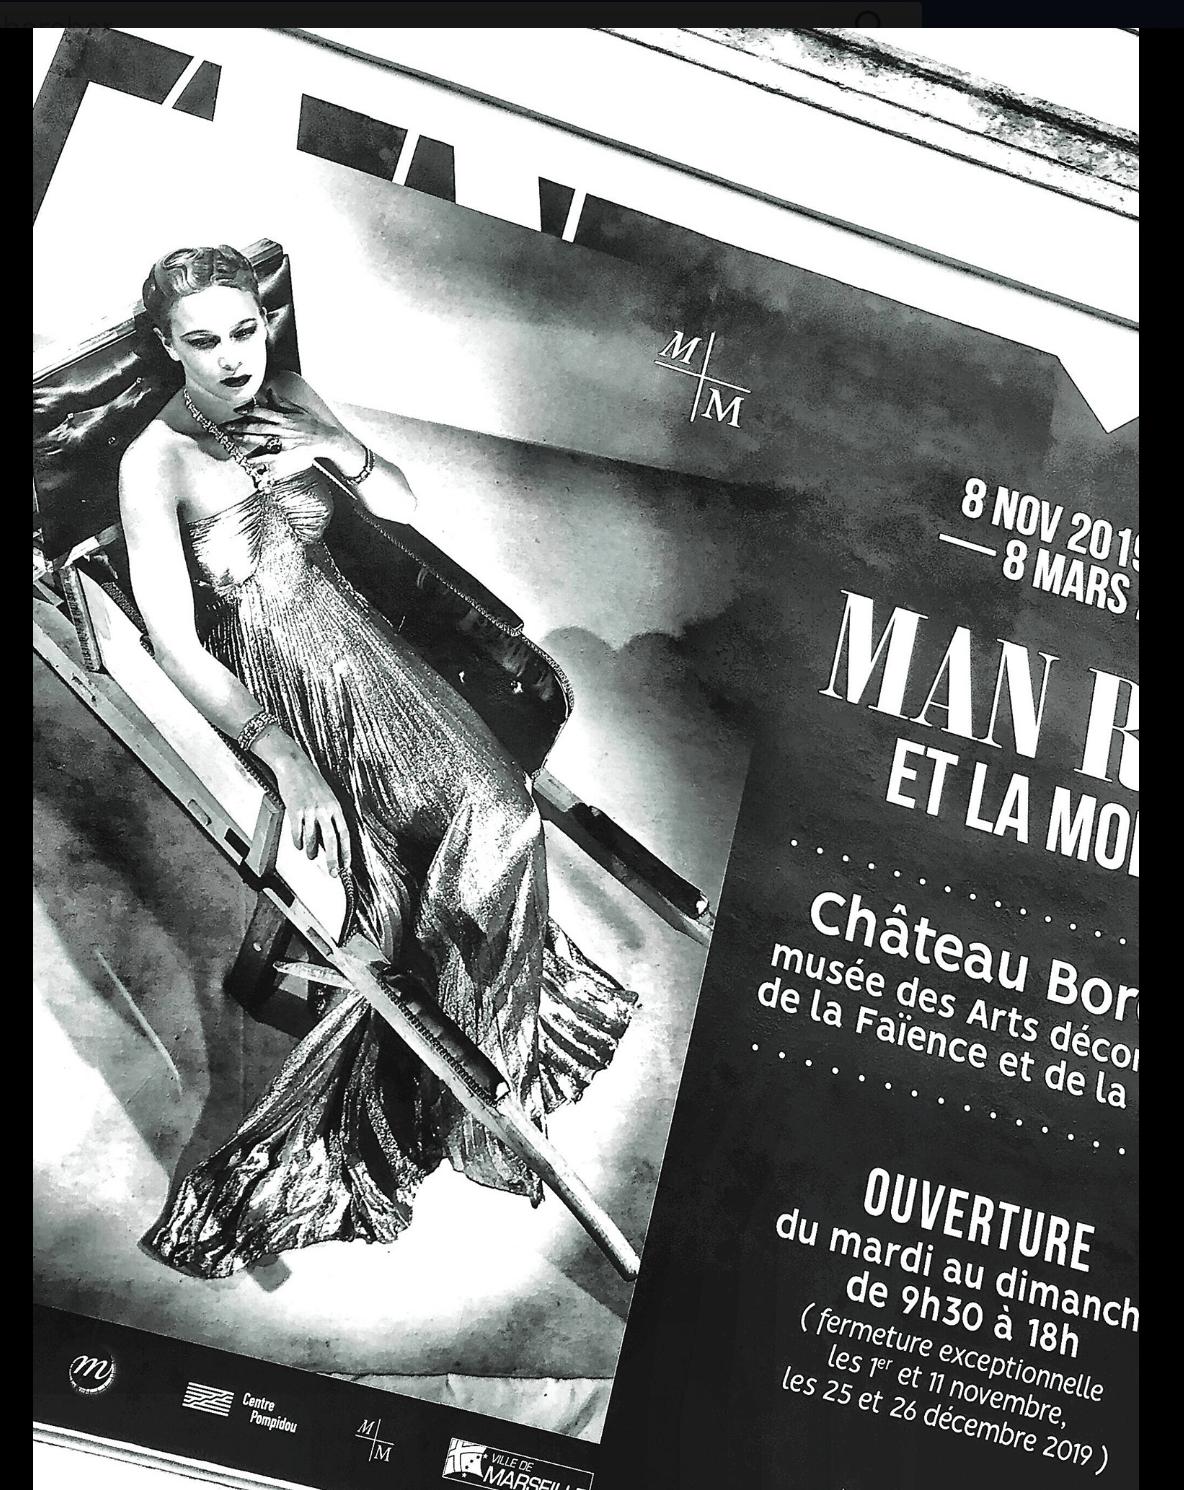 Yvi Slan dj Set vernissdage expo Man Ray